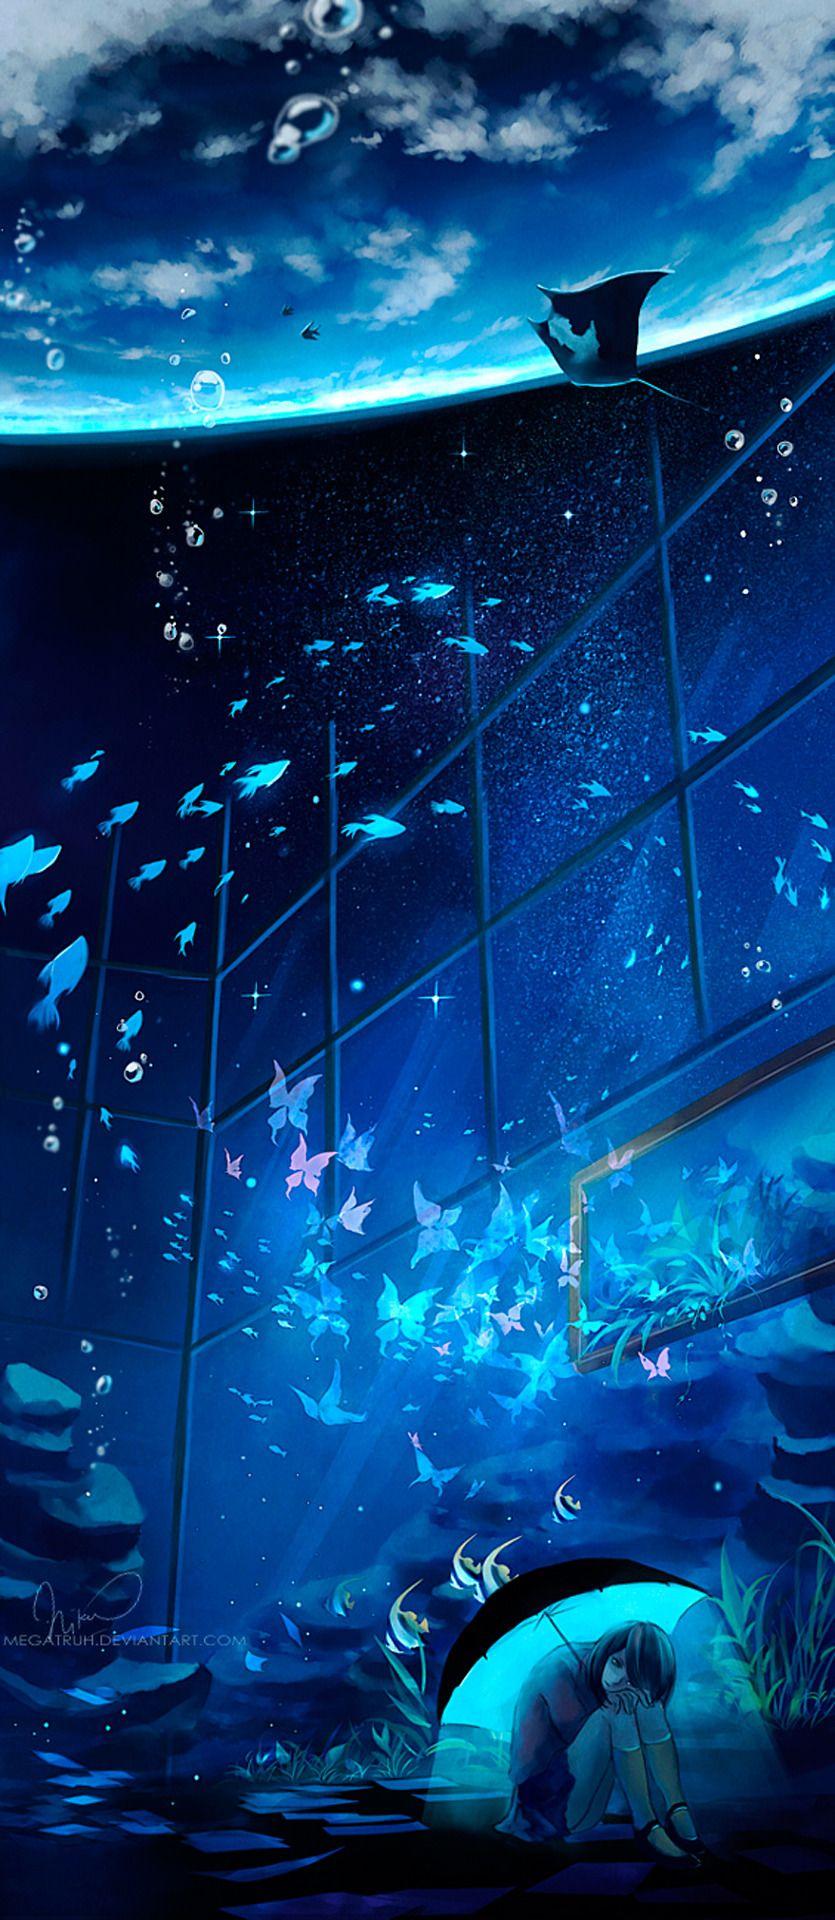 Tags Animal Butterfly Night Sad Scenic Skirt Stars Umbrella Underwater Artist Megatruh